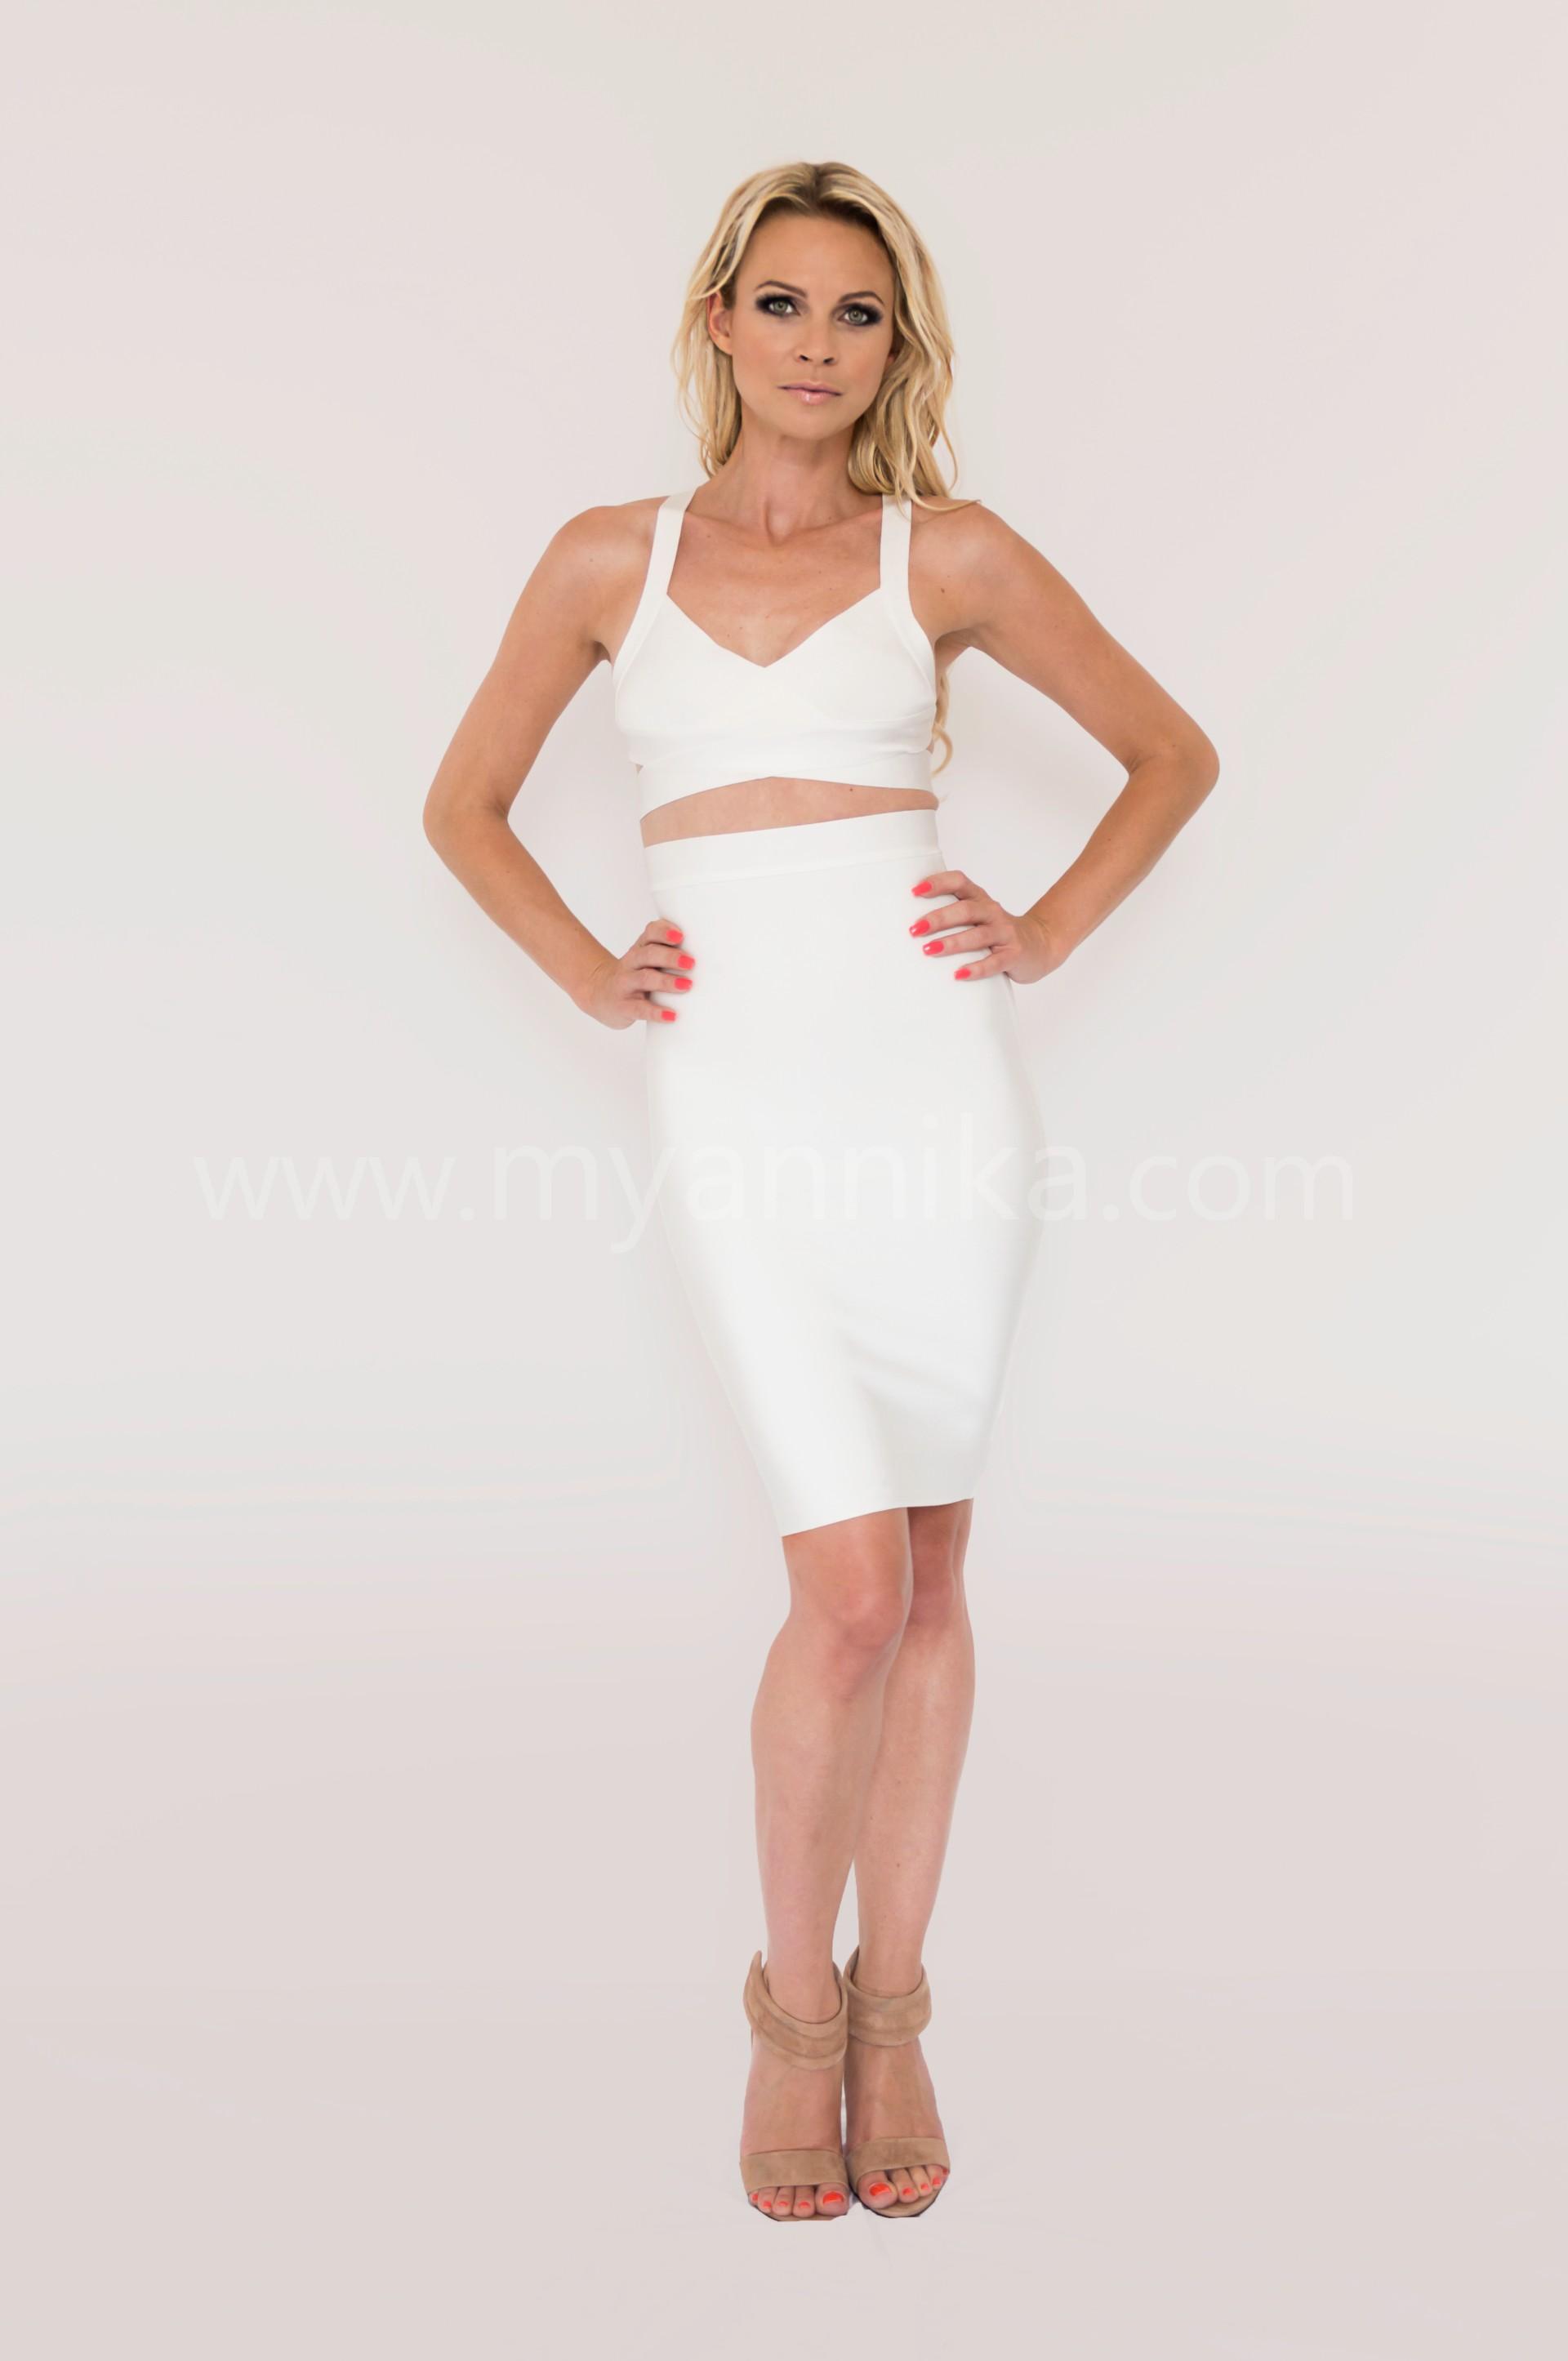 Malibu - White 2 Piece Celebrity Style Bandage Dress Combo with Pencil Skirt and Crop Top Annika - Bandage Dresses | Celebrity Party Dresses | Herve Leger Dresses Bandage dress detail